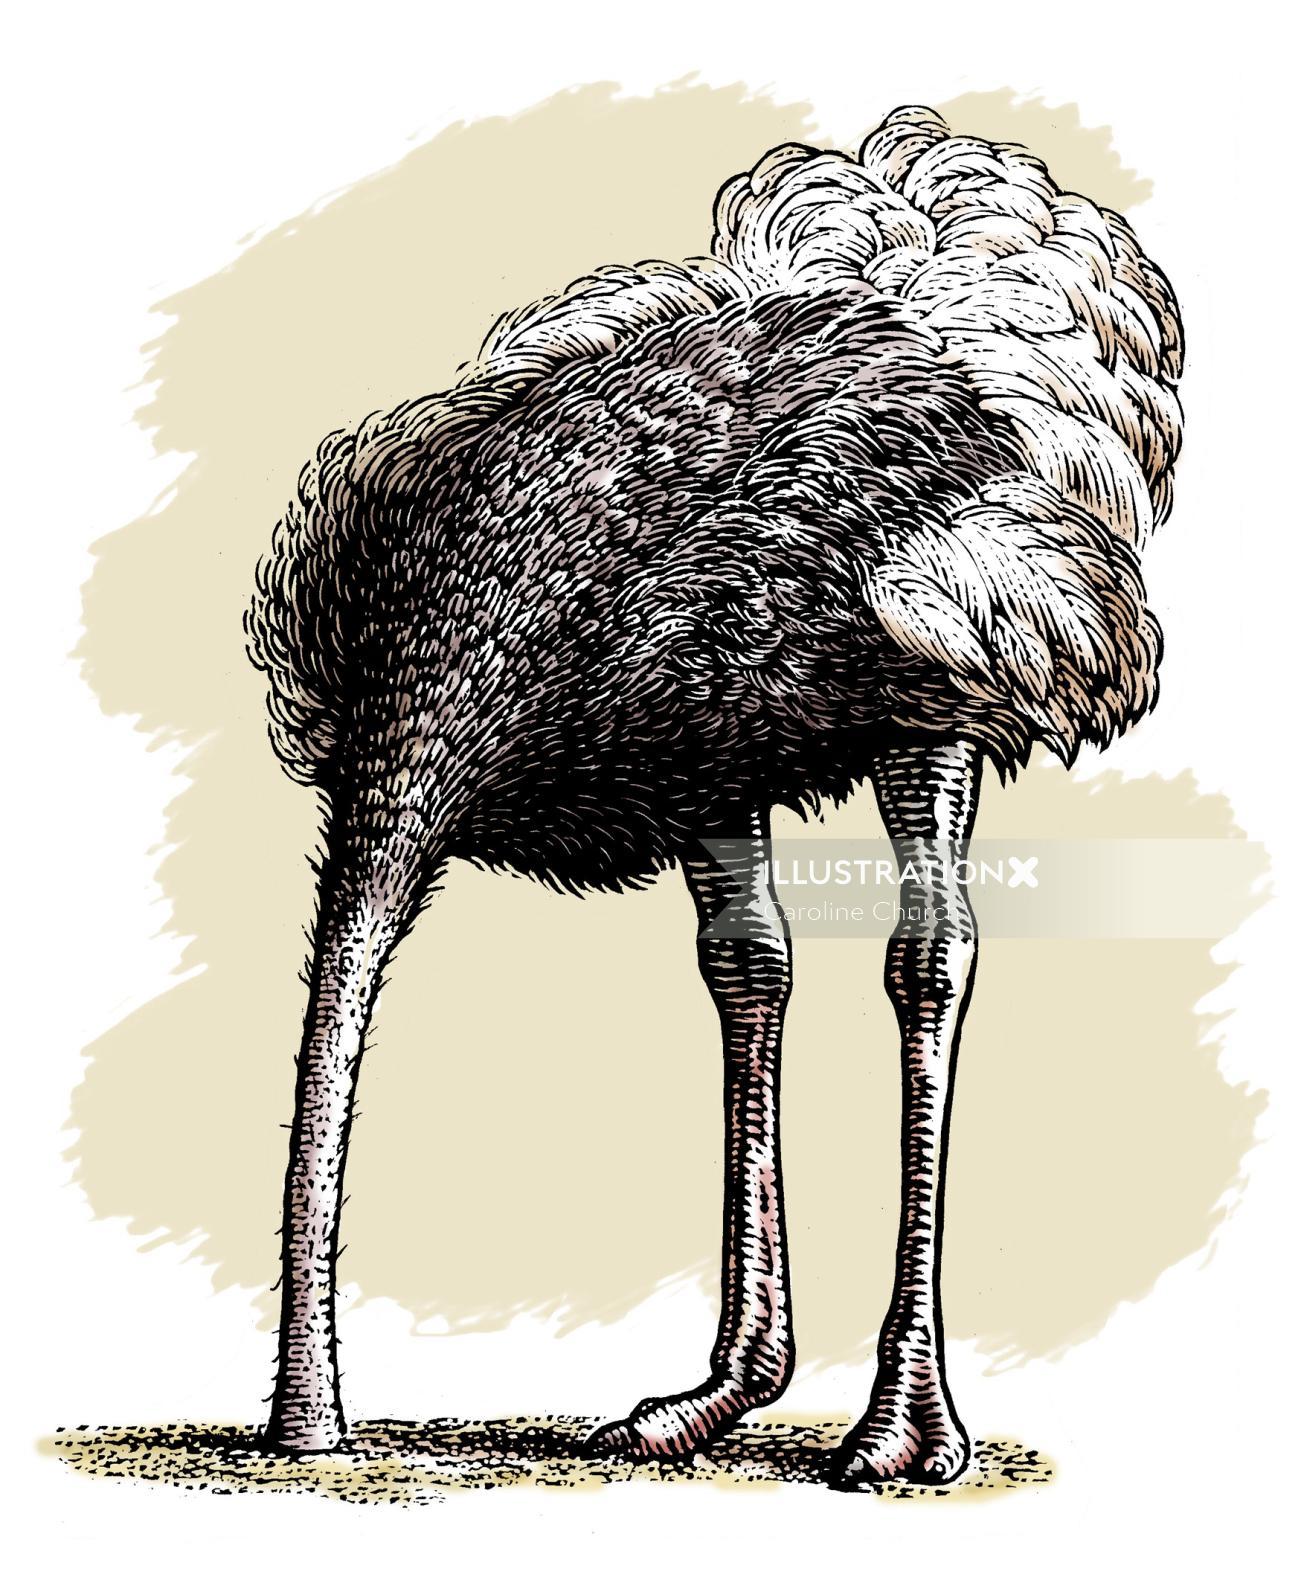 Emu Birds animal illustration